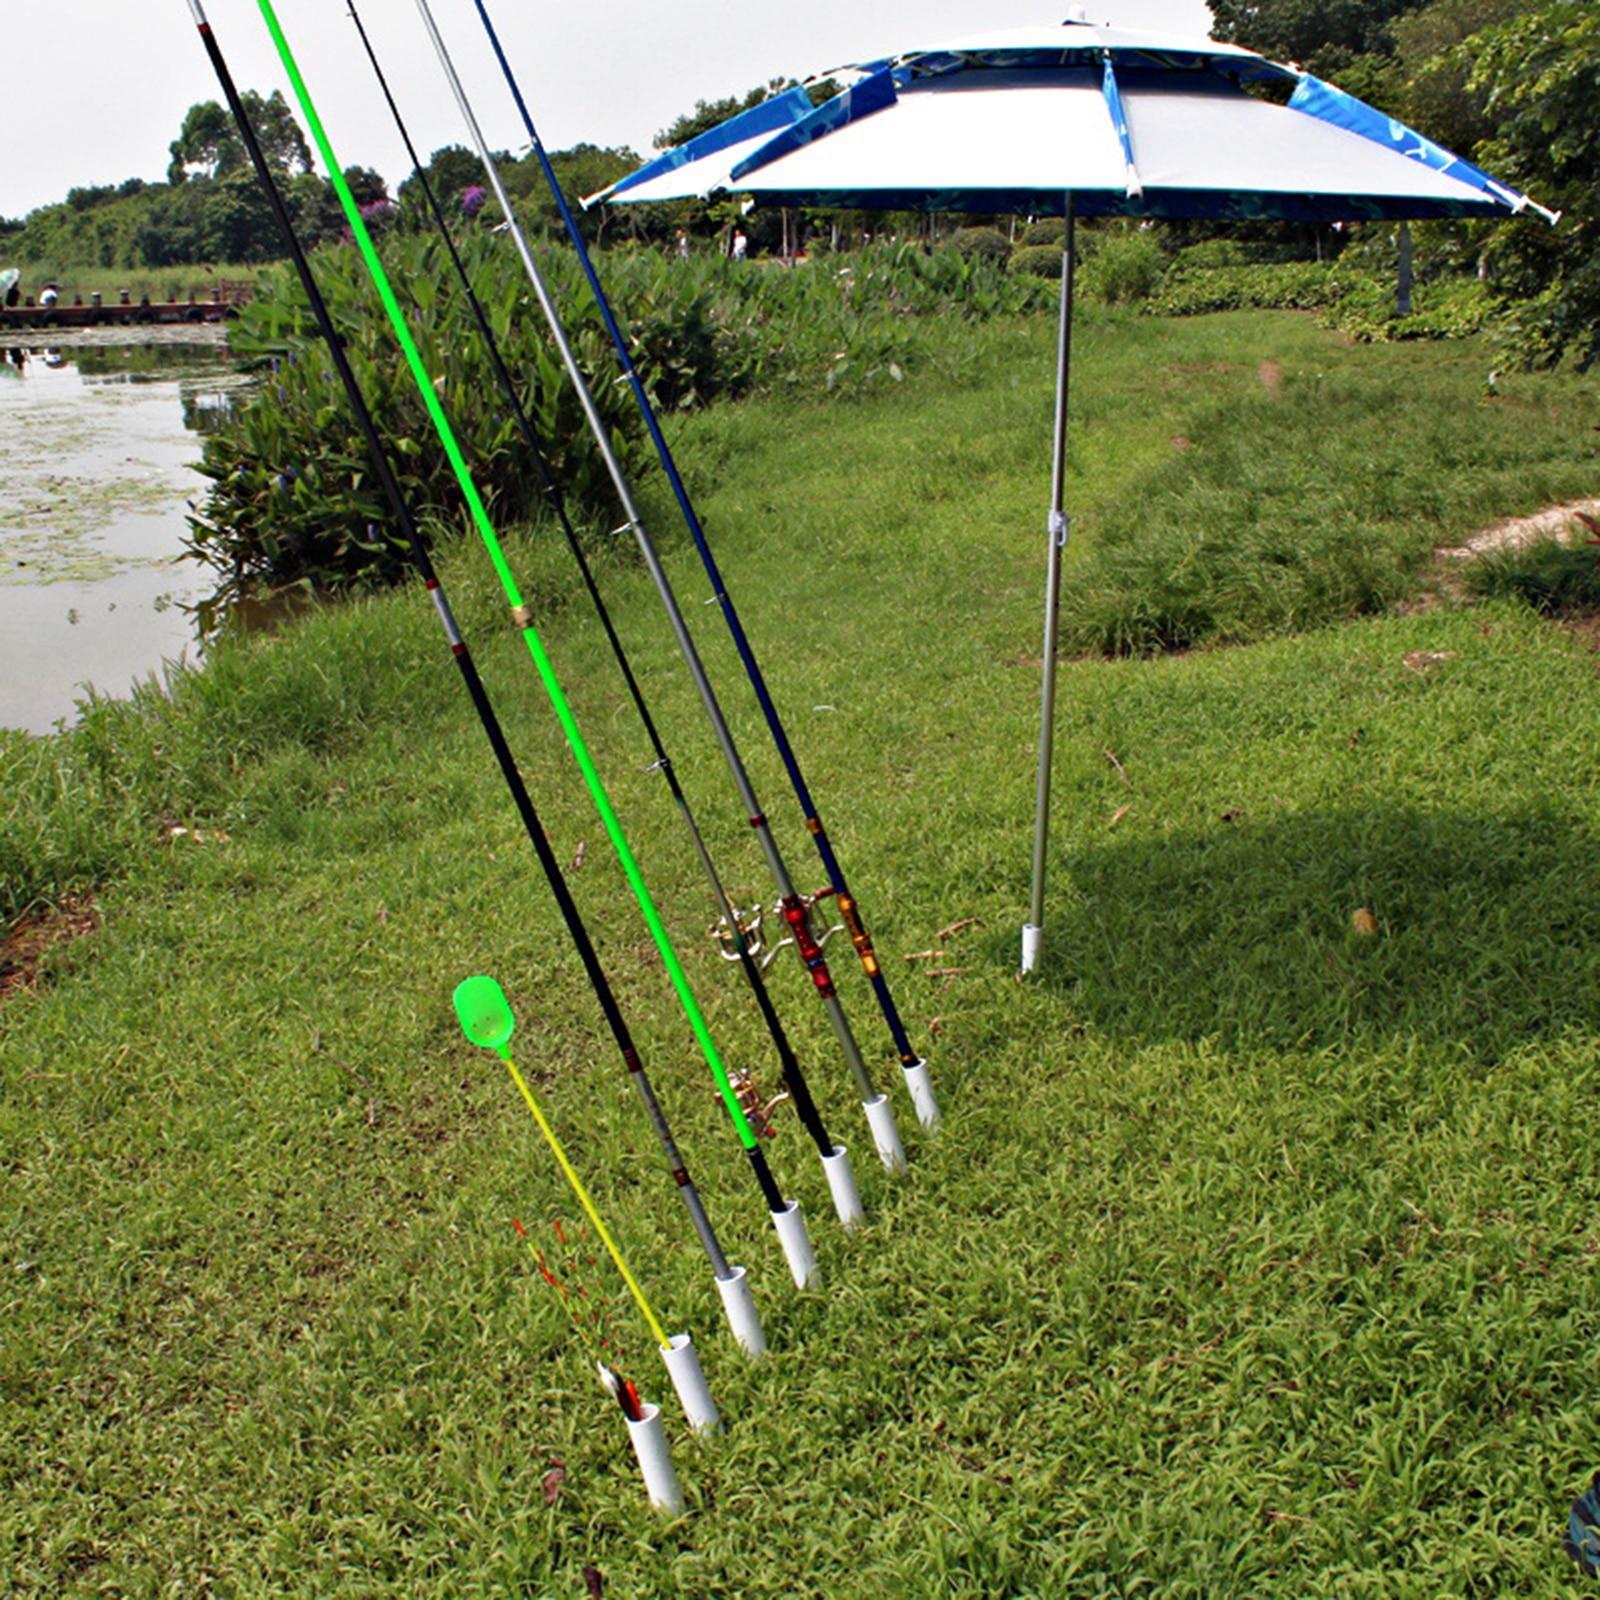 Fishing Rod Pole Holder Ground PVC Detachable for Shore Fishing Fishing